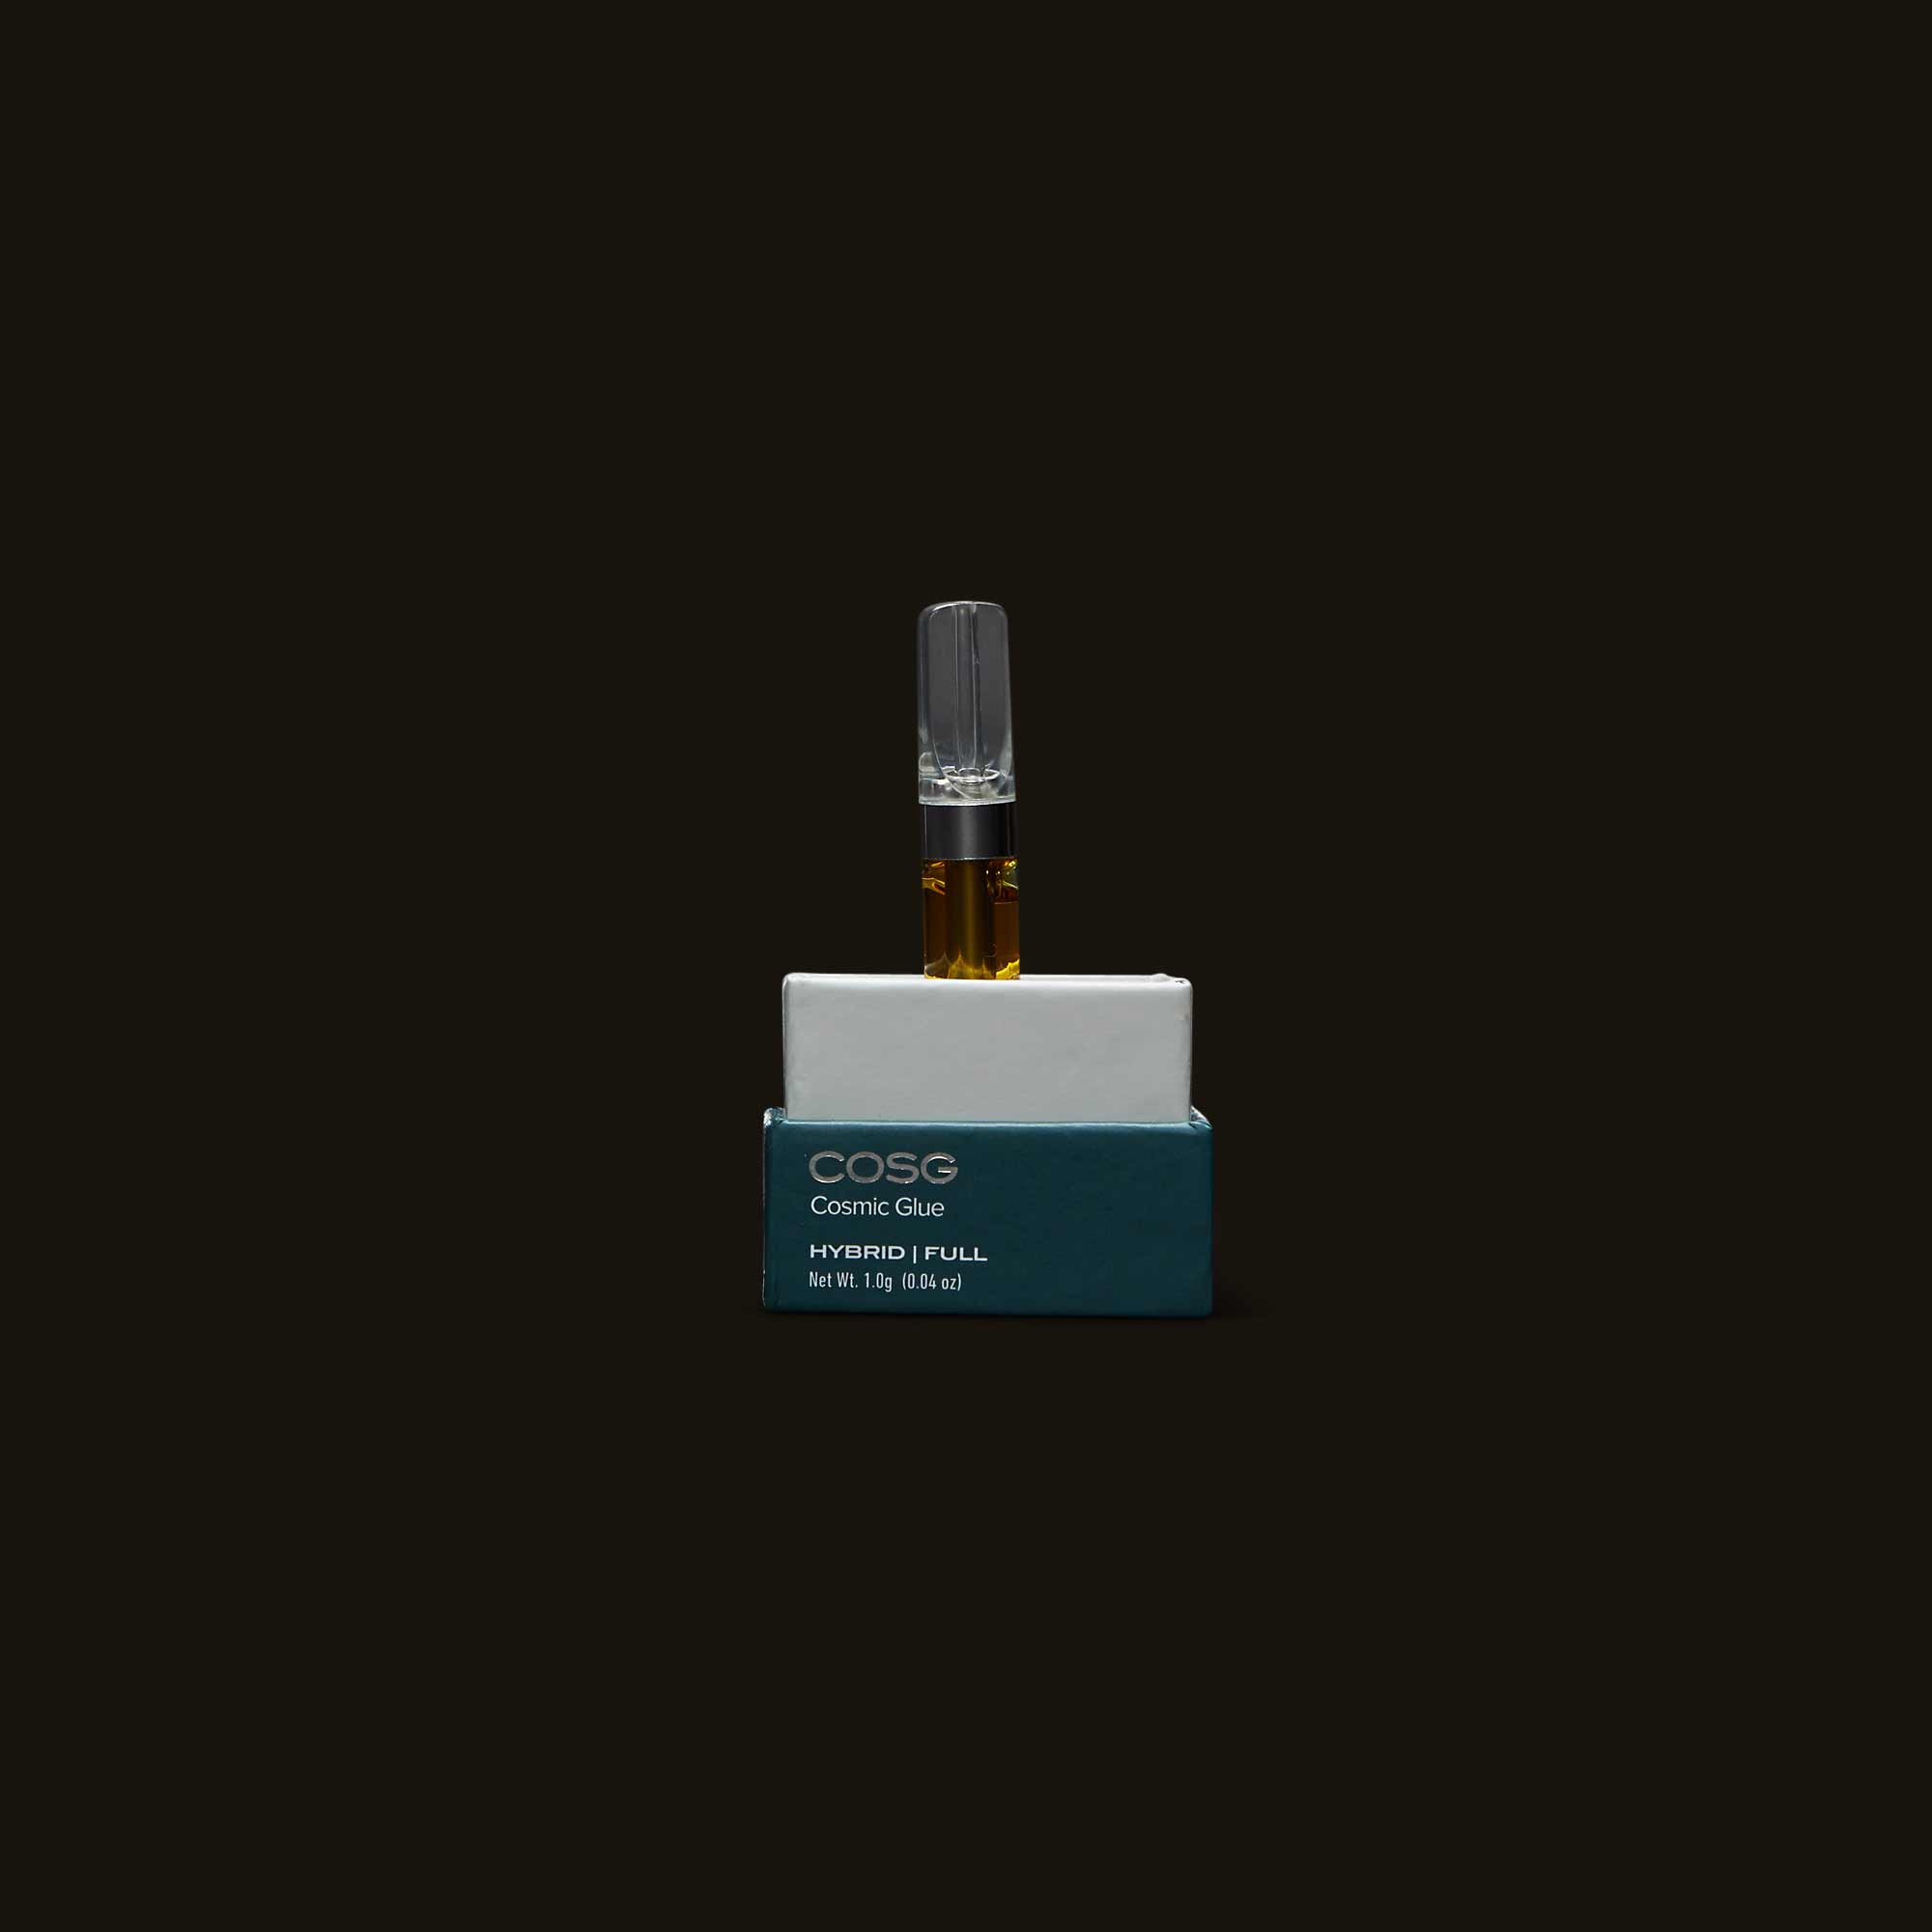 Cosmic Glue Vape Cartridge on display